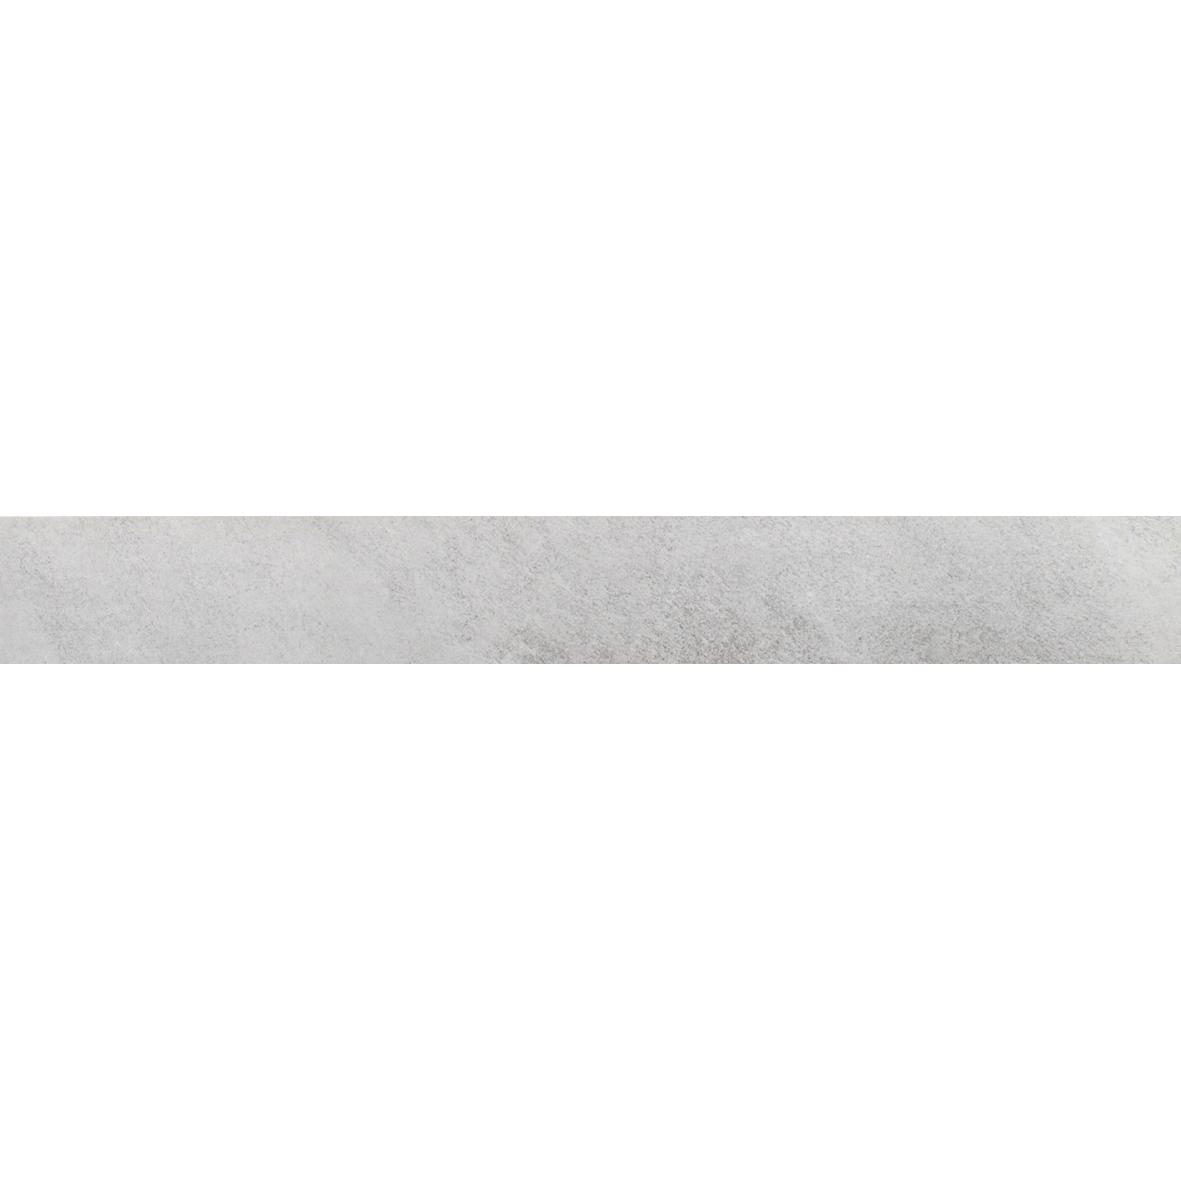 Klinker Arredo Anderstone Grey 8x60 cm